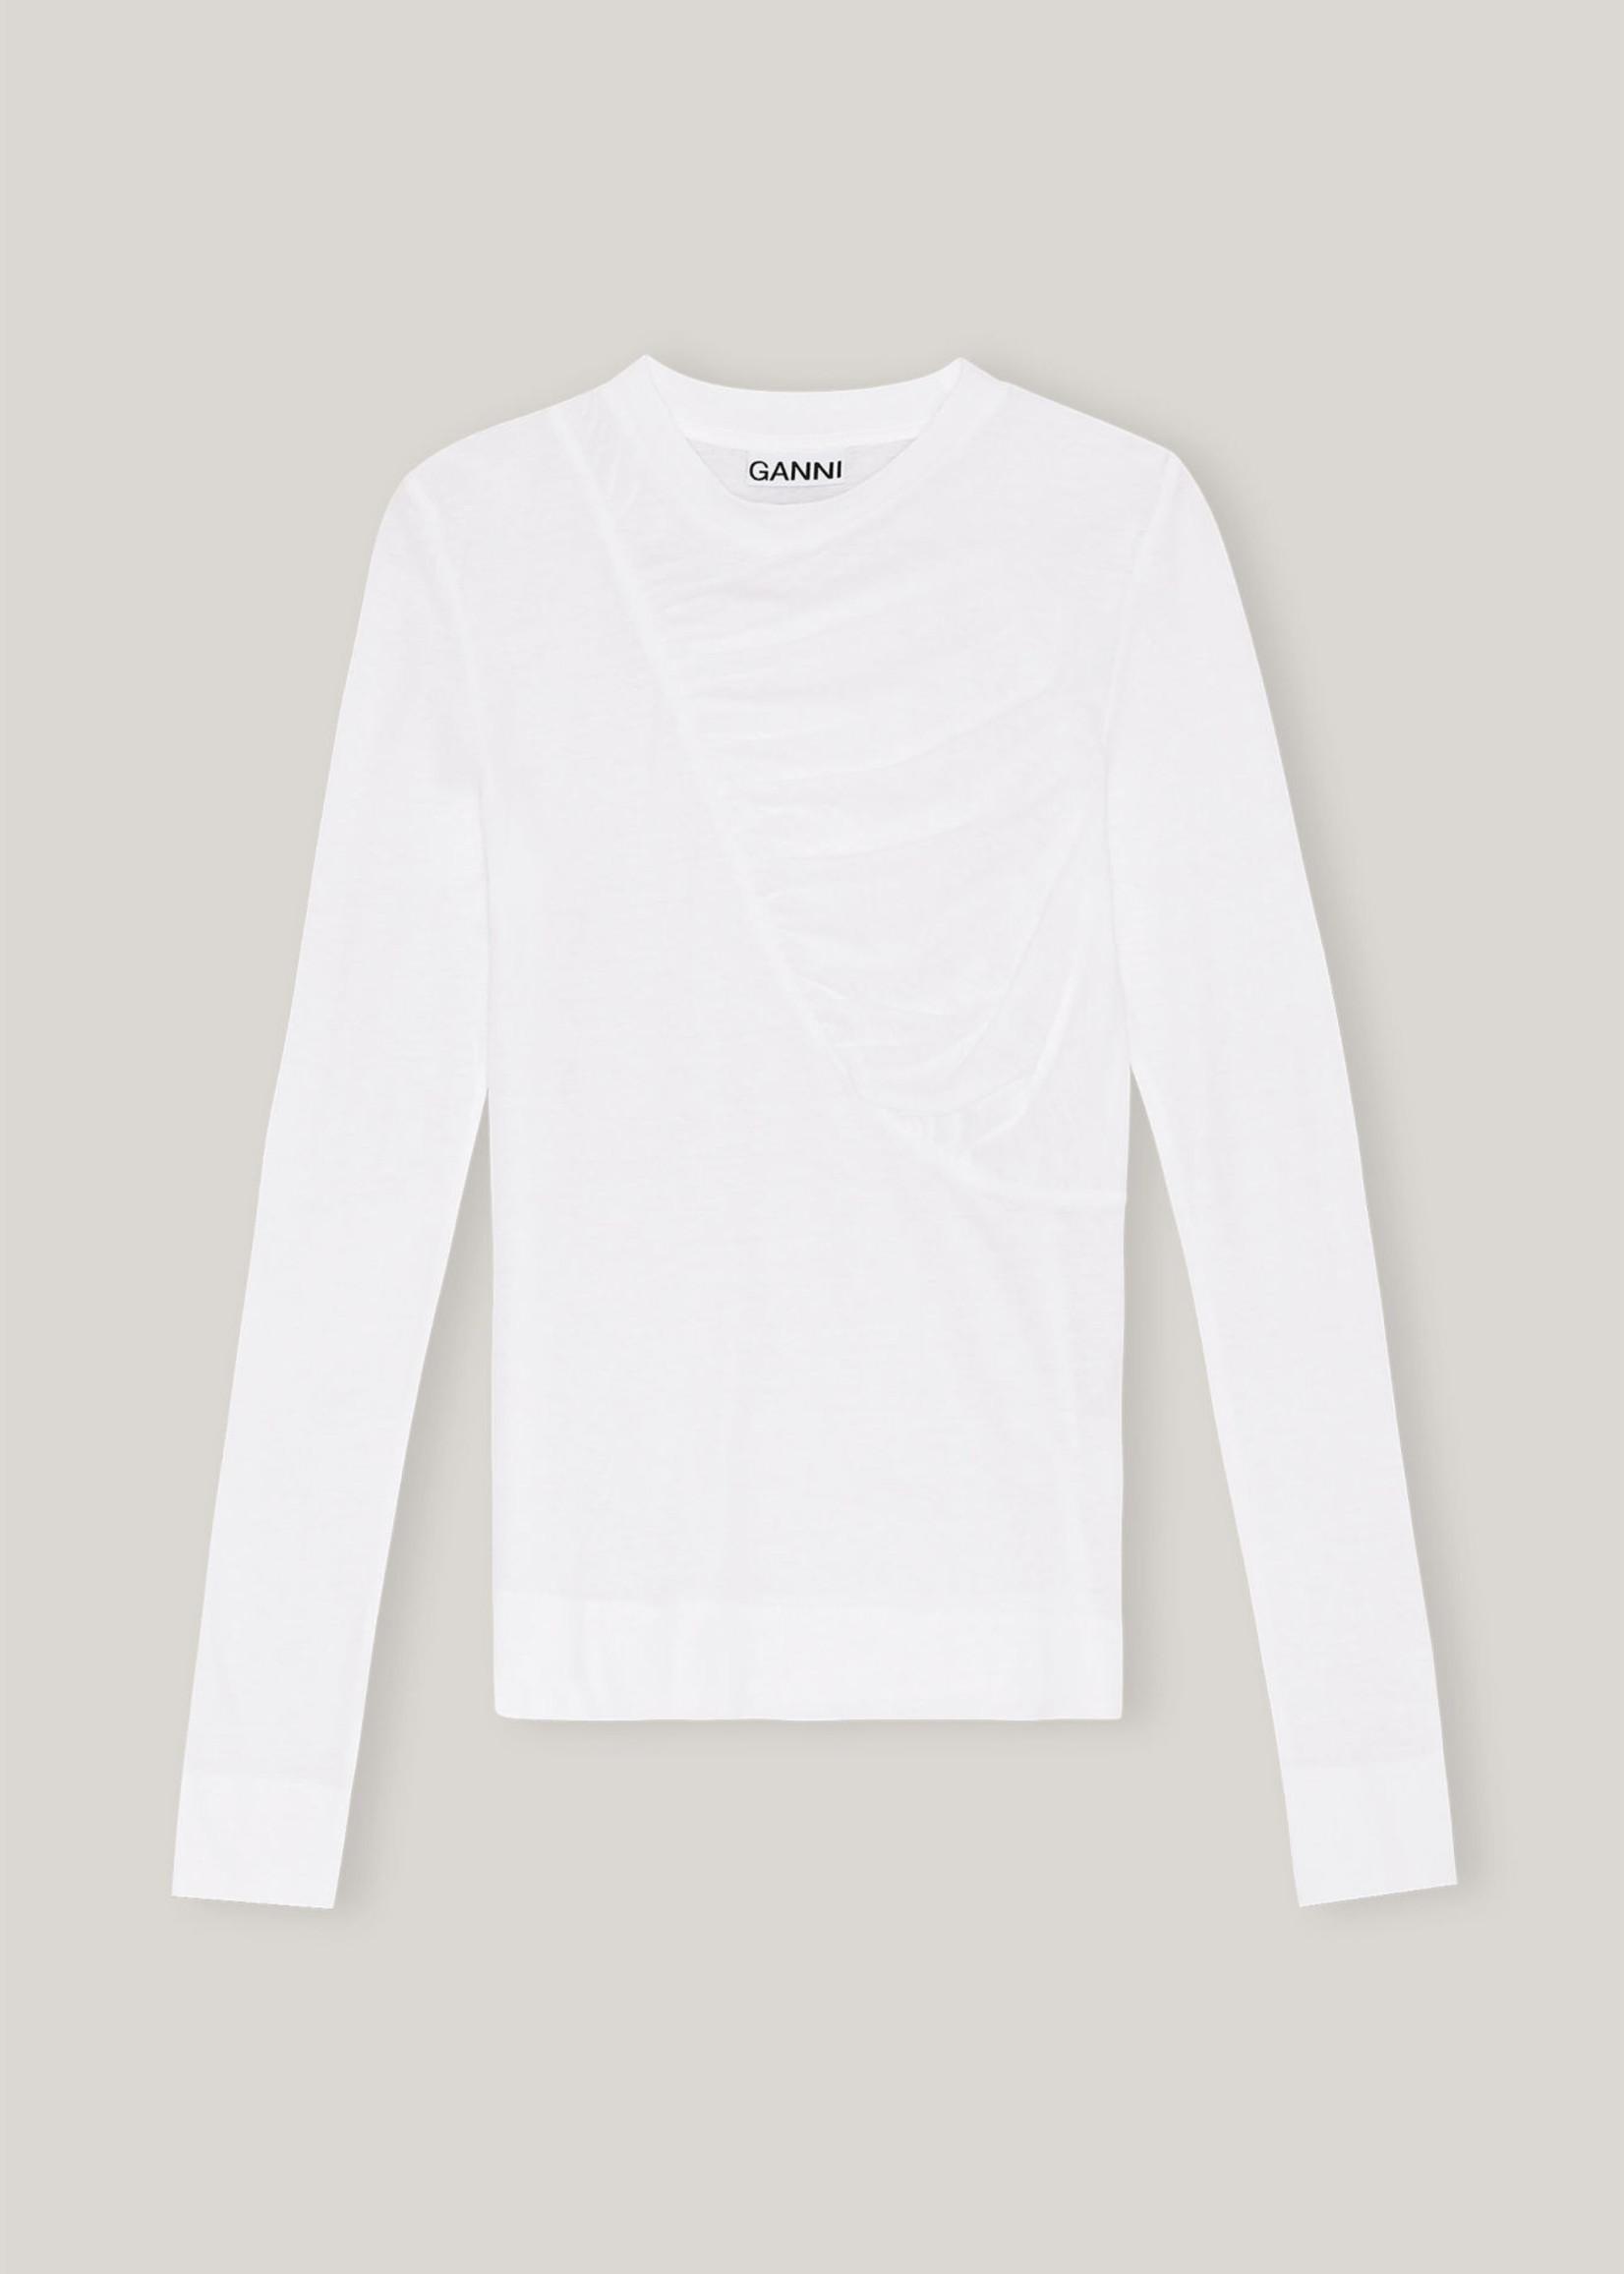 GANNI Gathered Long Sleeve T-shirt in White